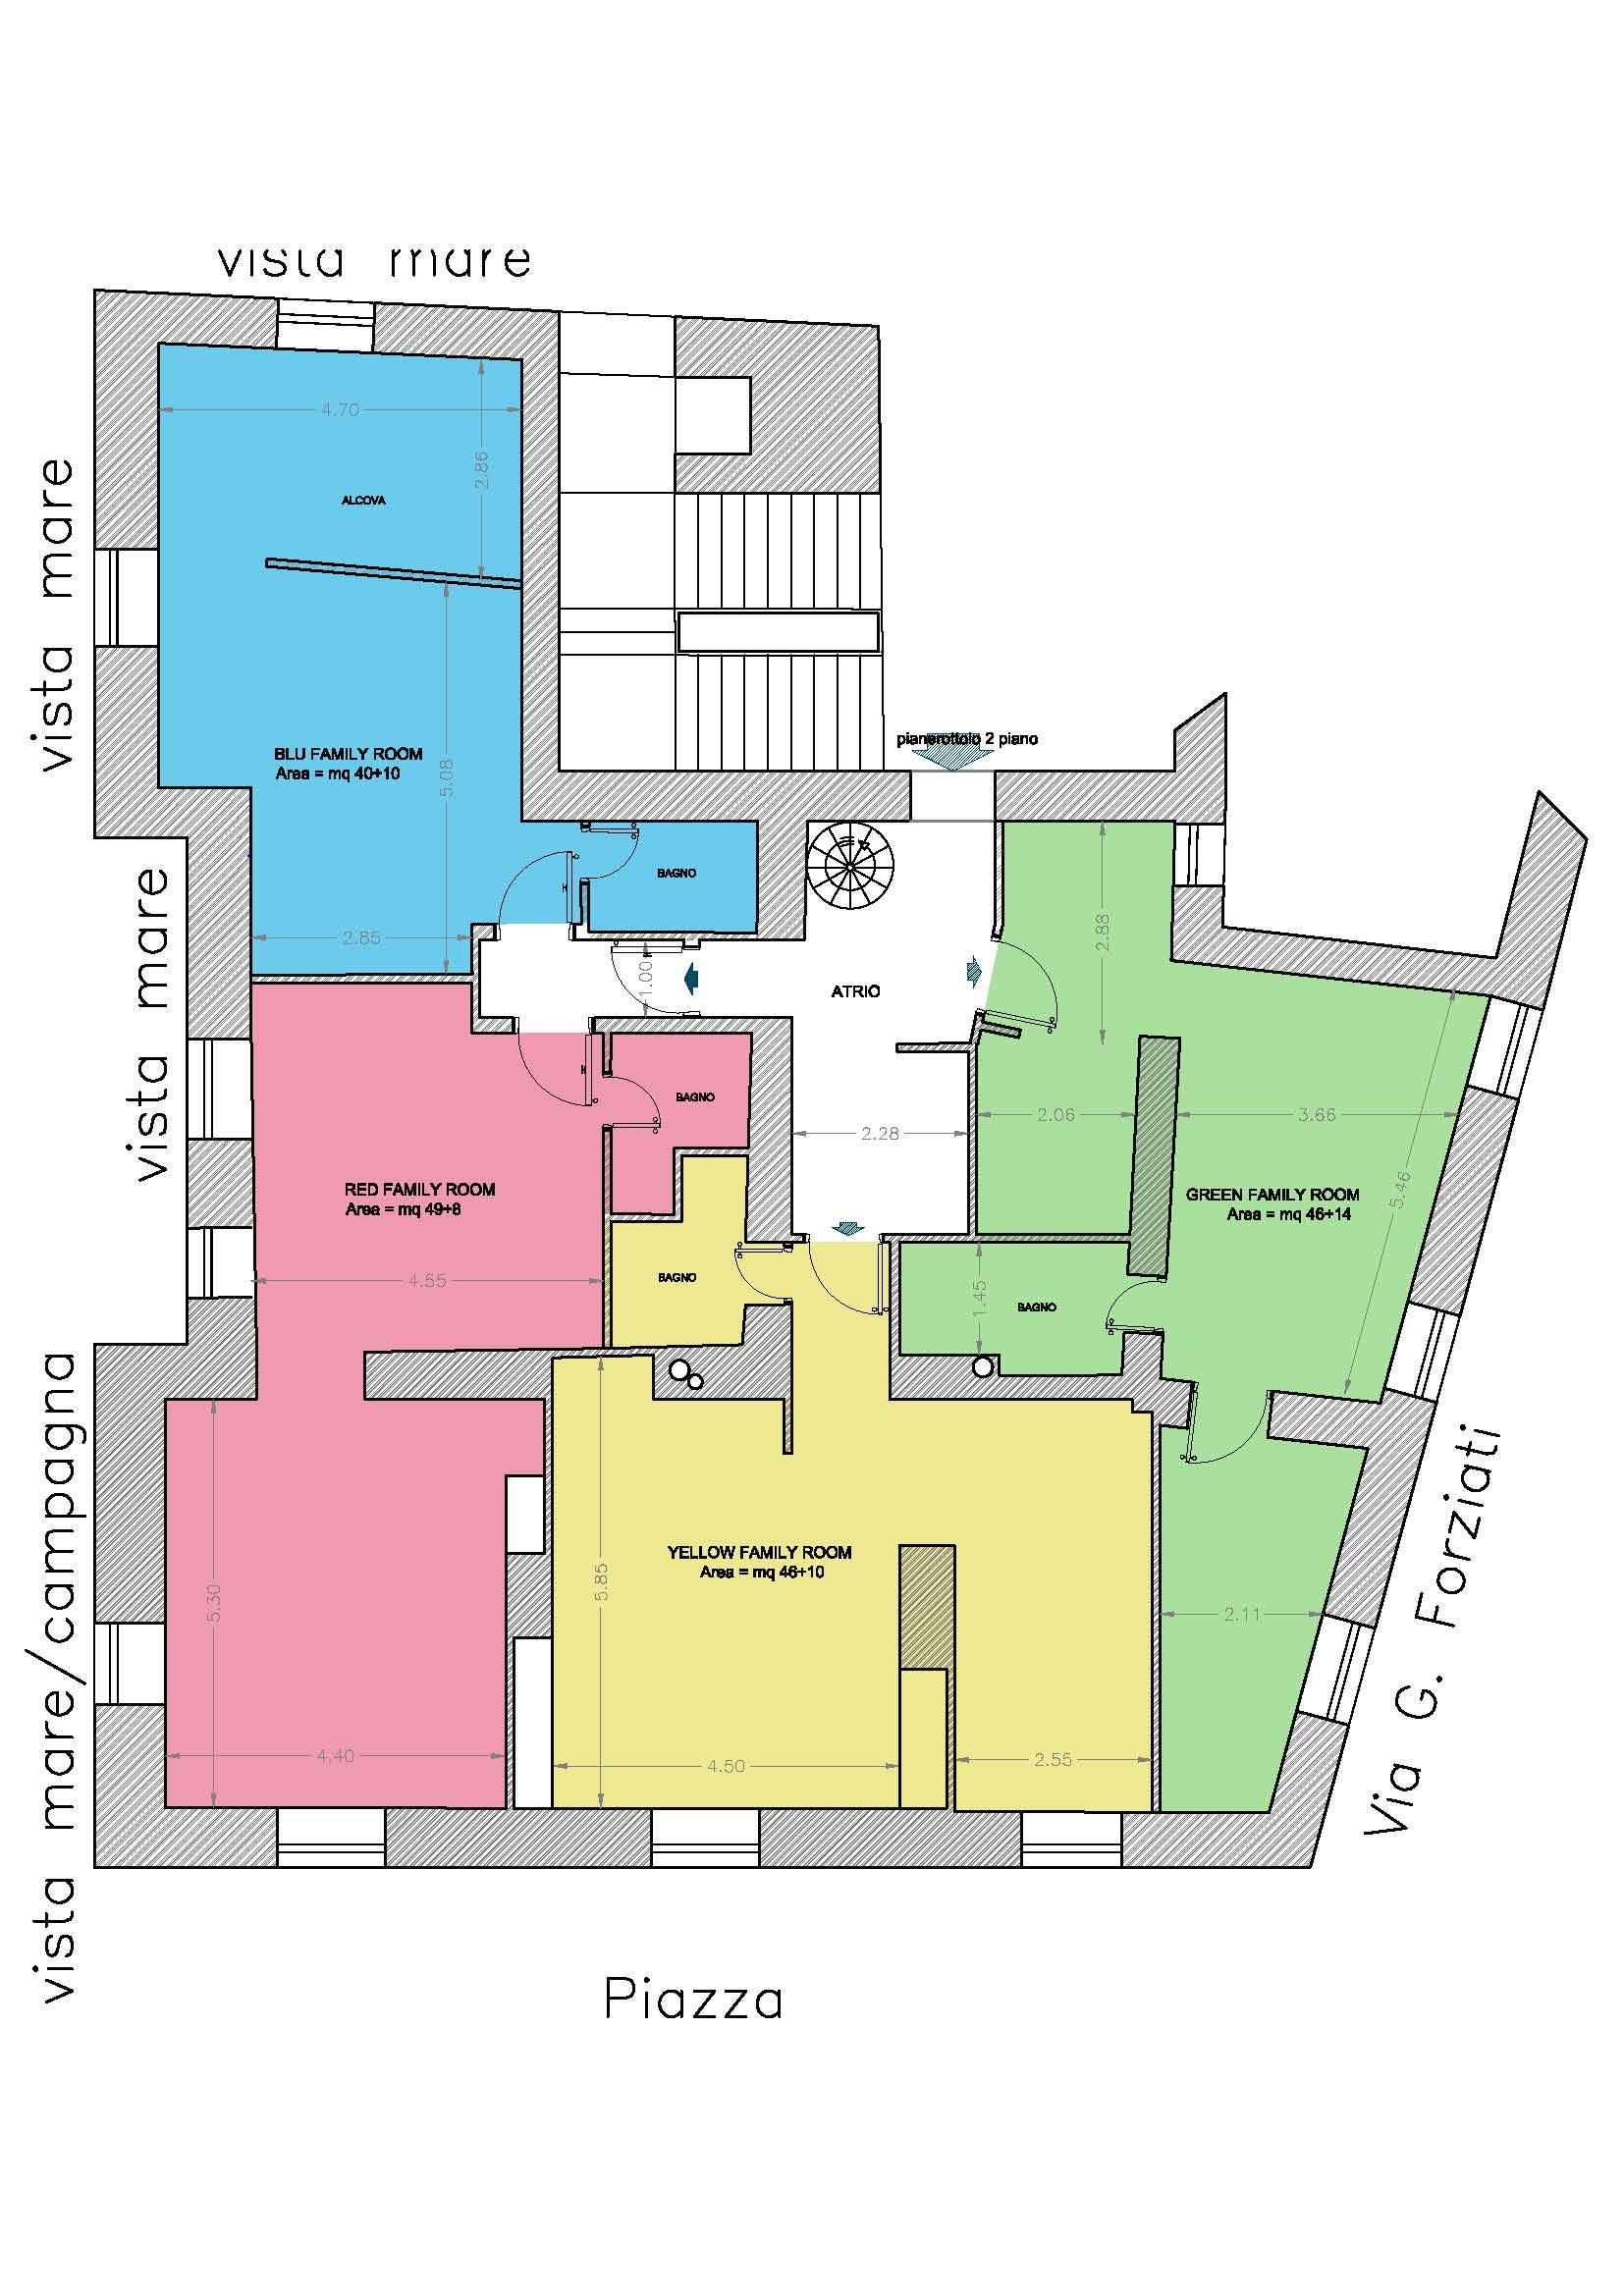 Planimetria delle Soffitte